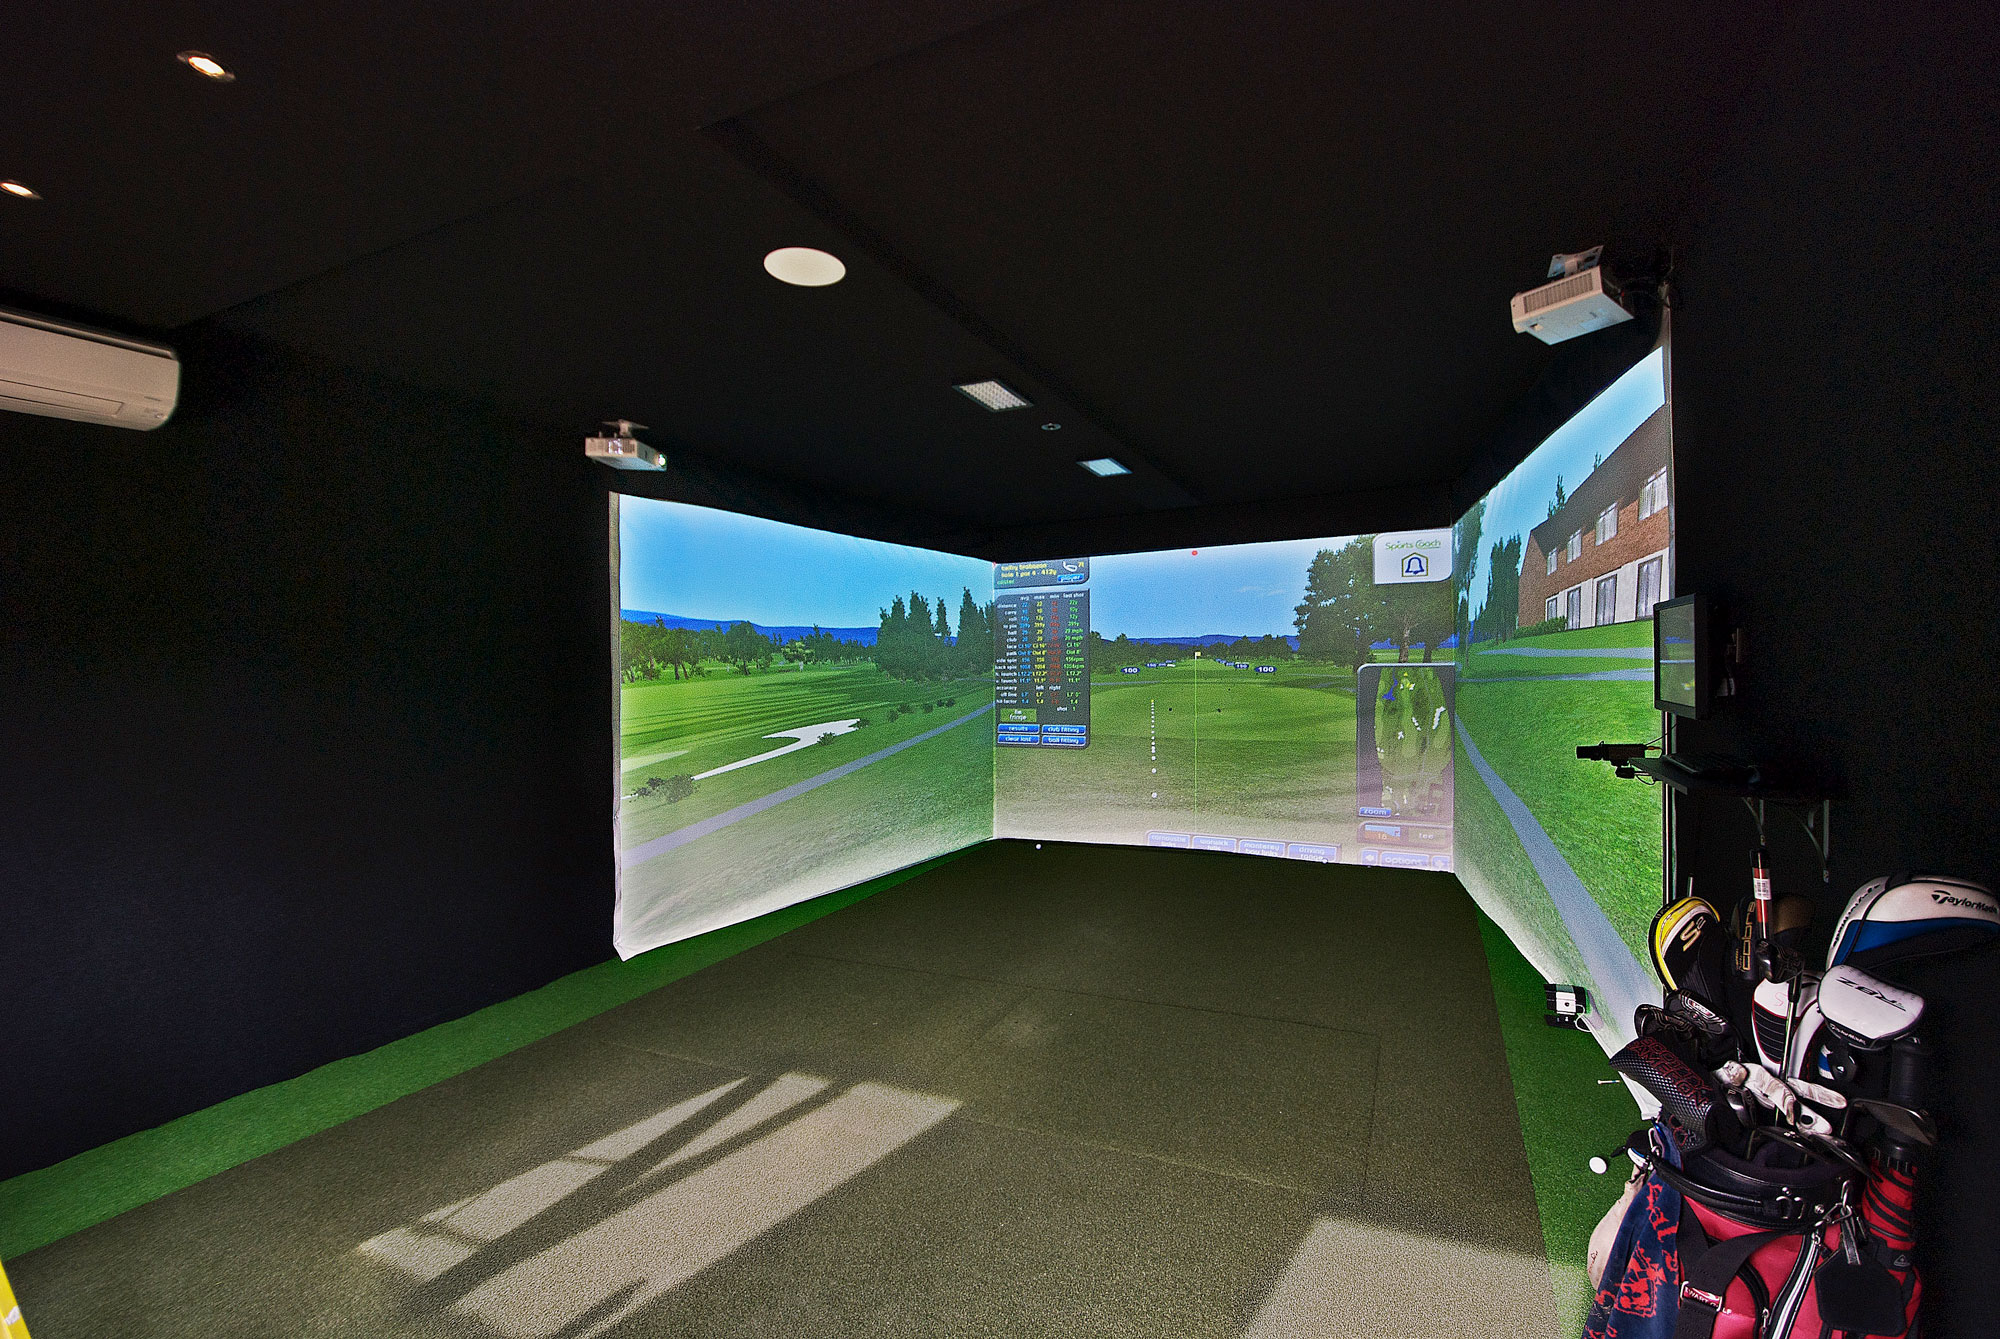 Garden Golf Simulator Cabin Cre8tive Rooms